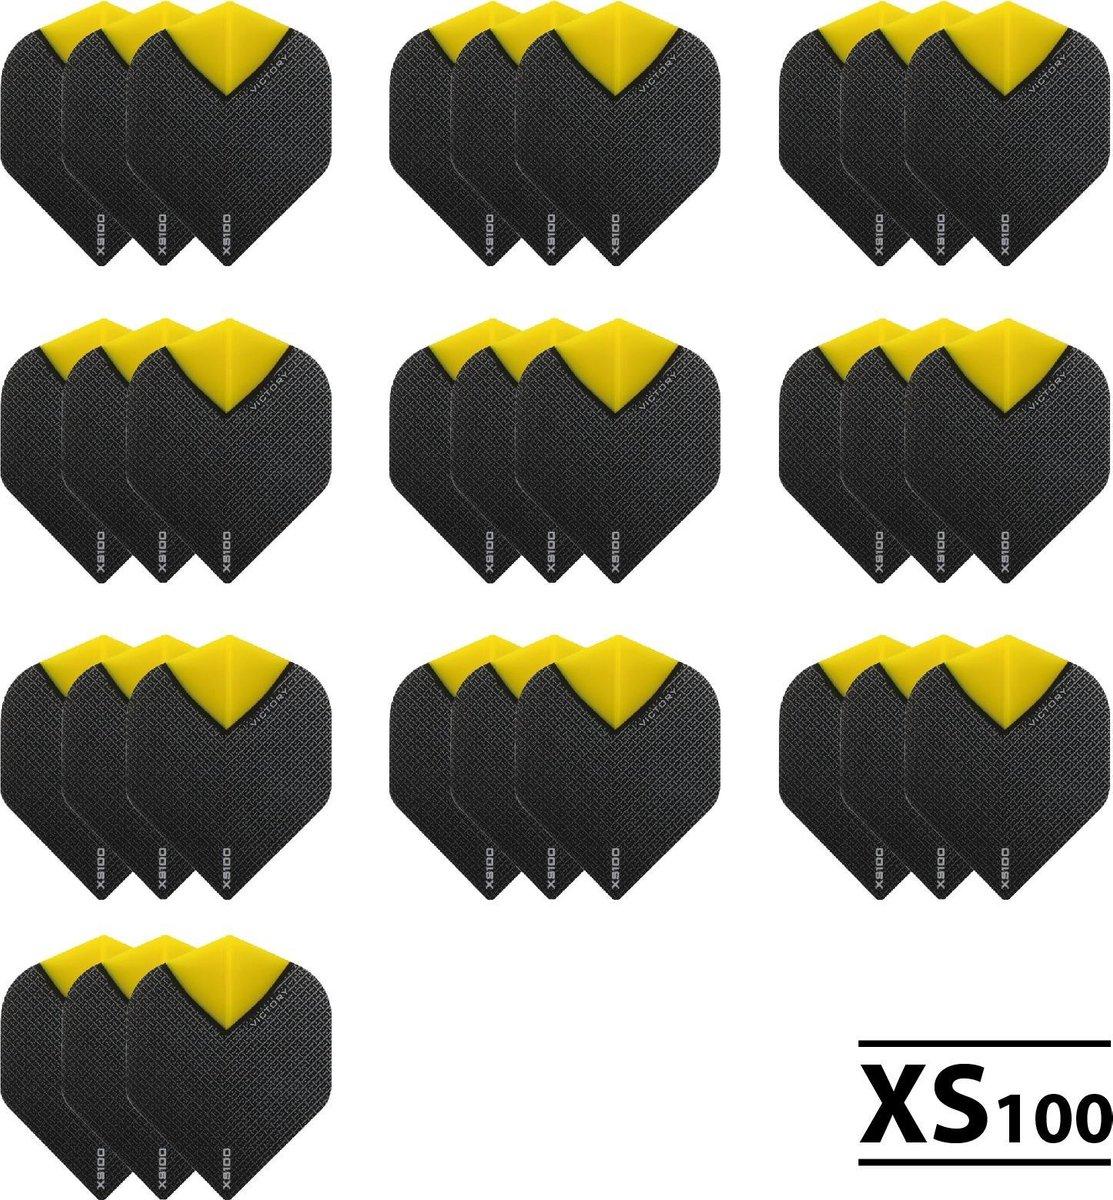 10 Sets (30 stuks) XS100 Skylight flights Multipack - Geel